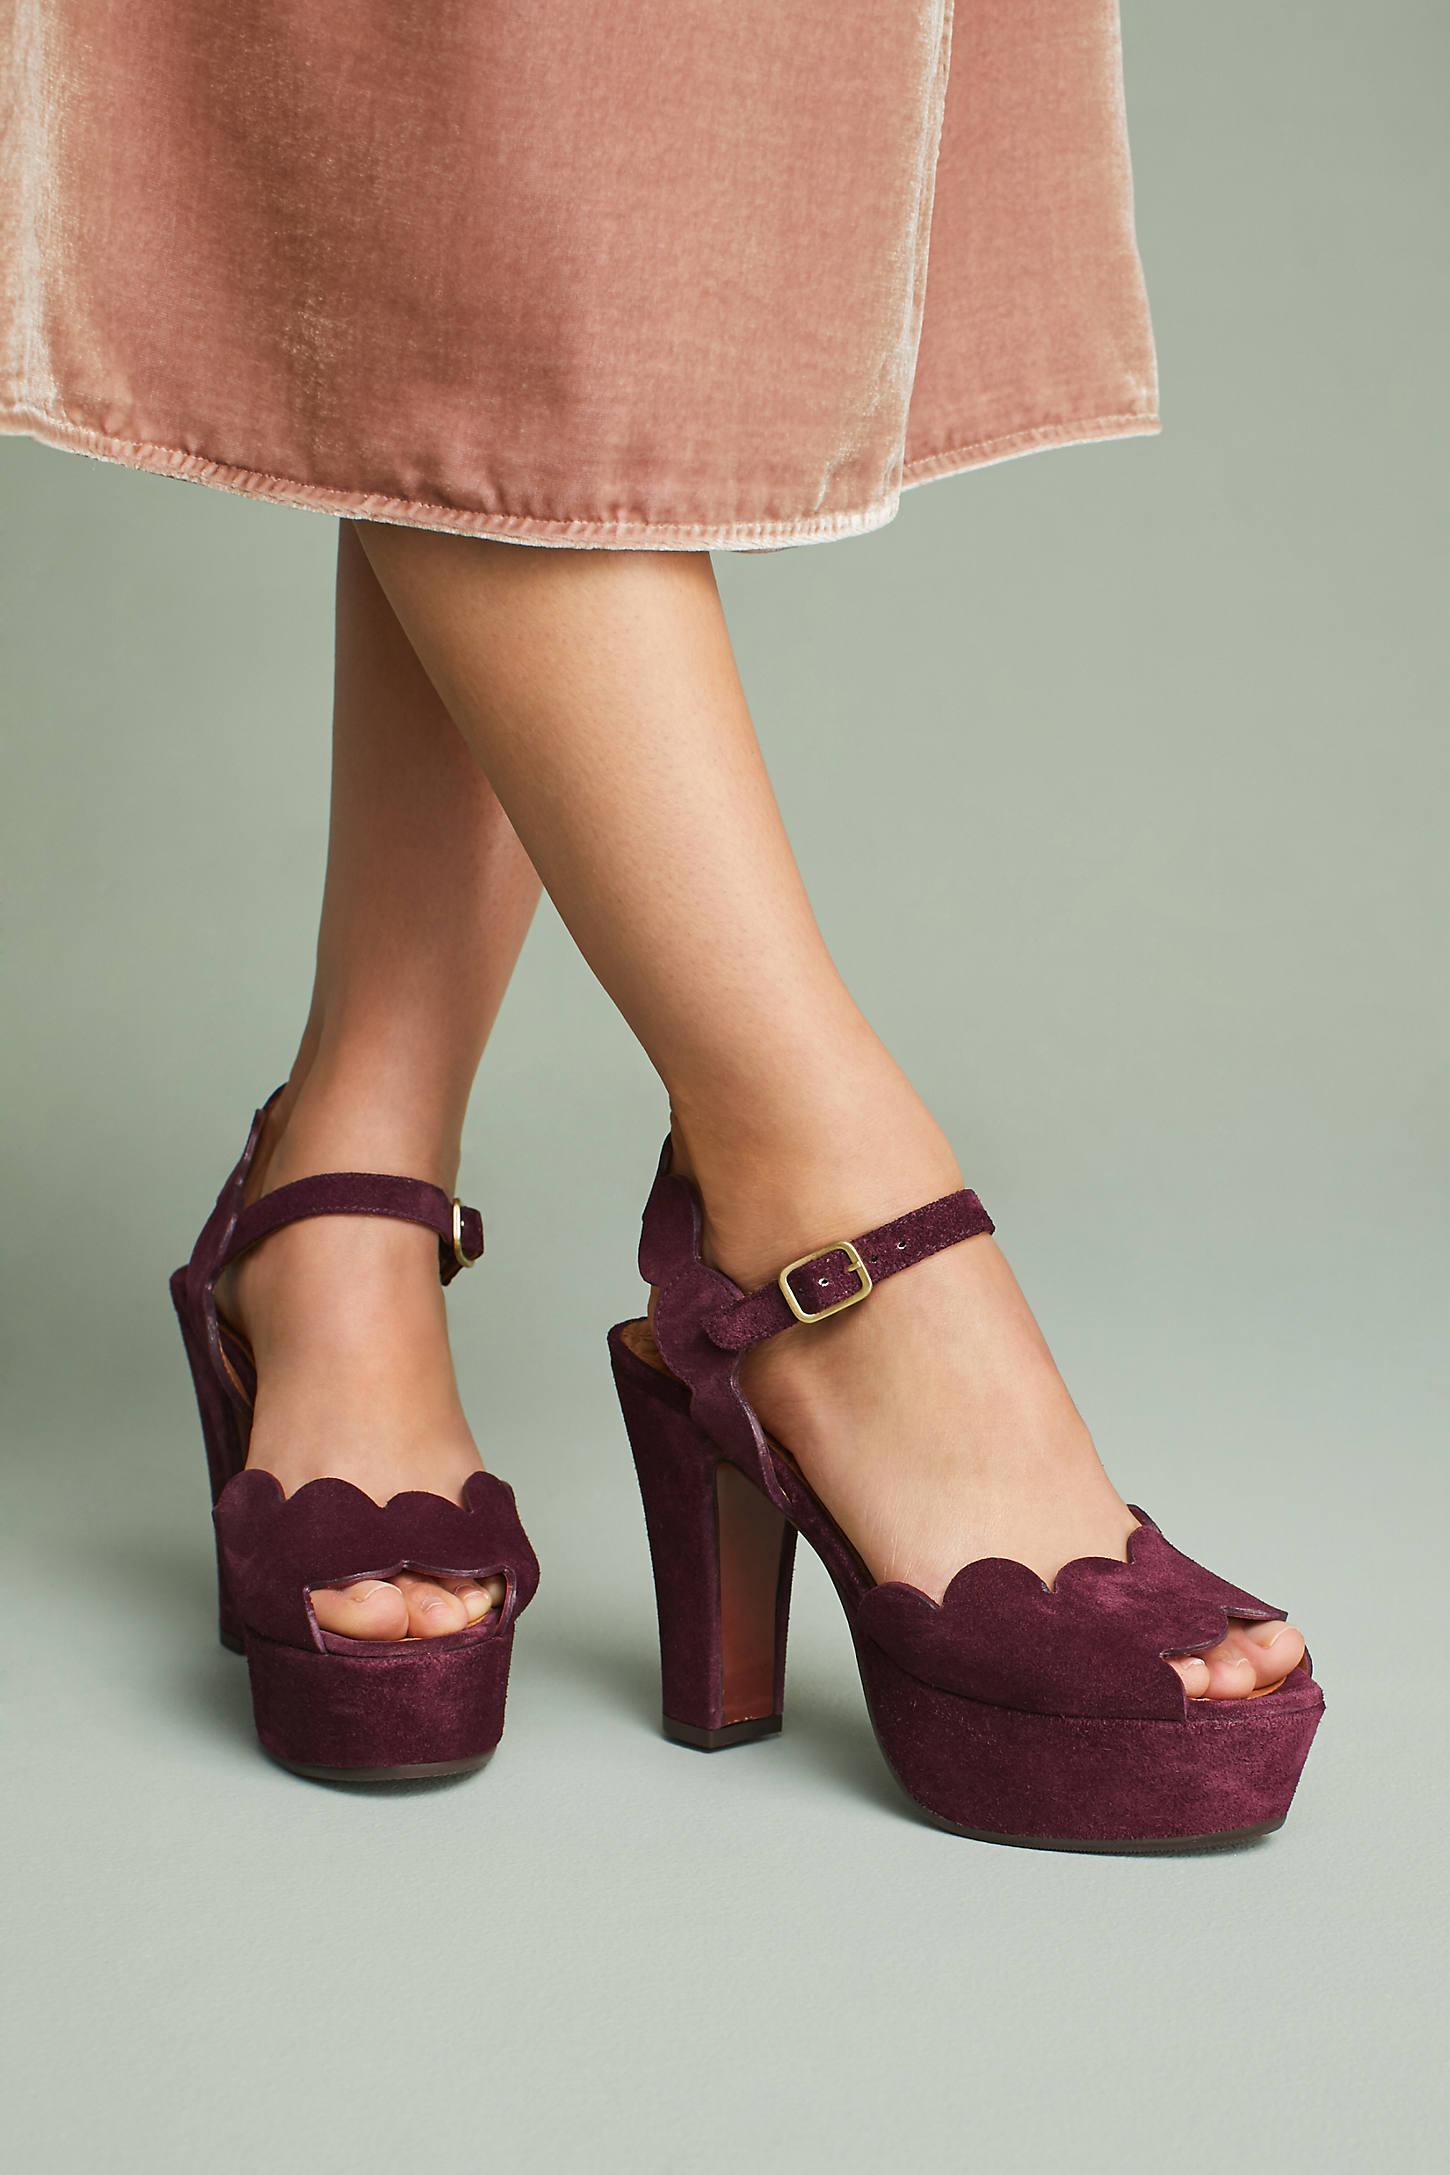 Chie Mihara Xevo Scalloped Heels